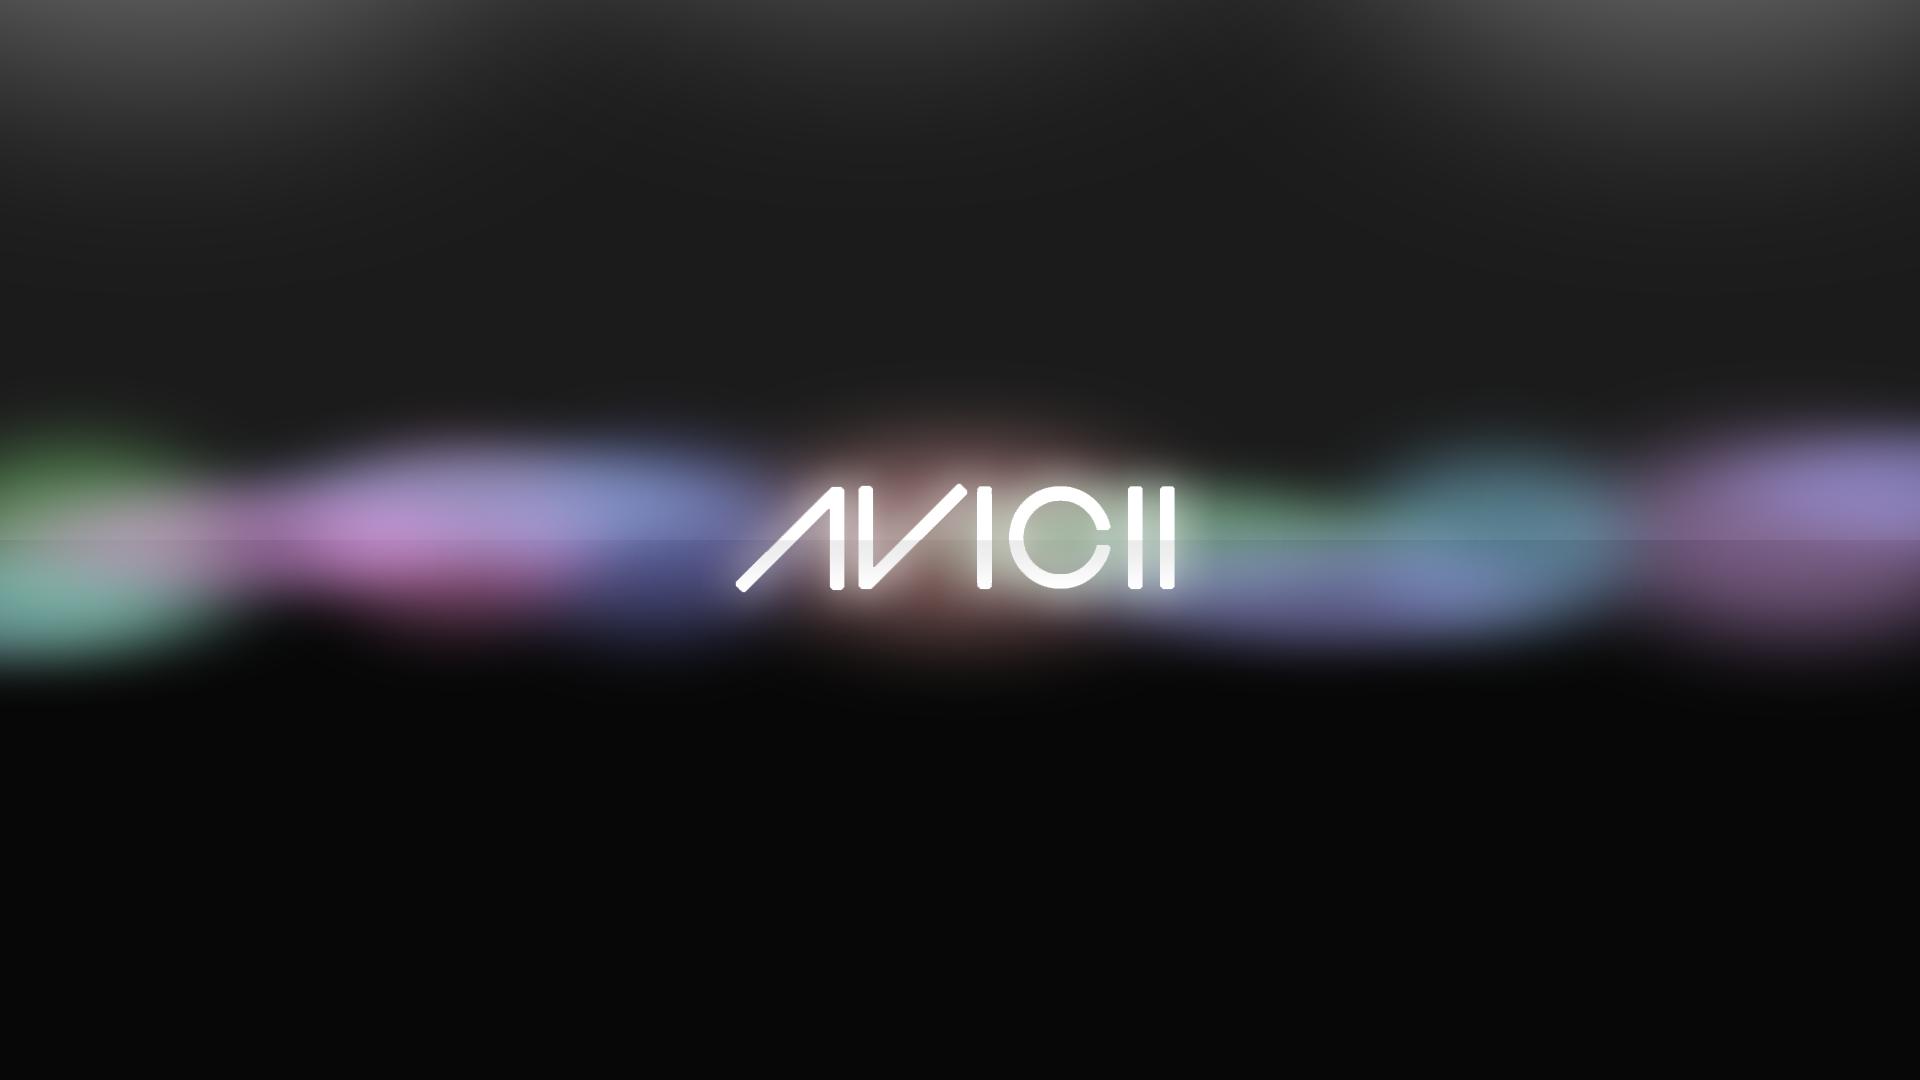 avicii triangles logo hd